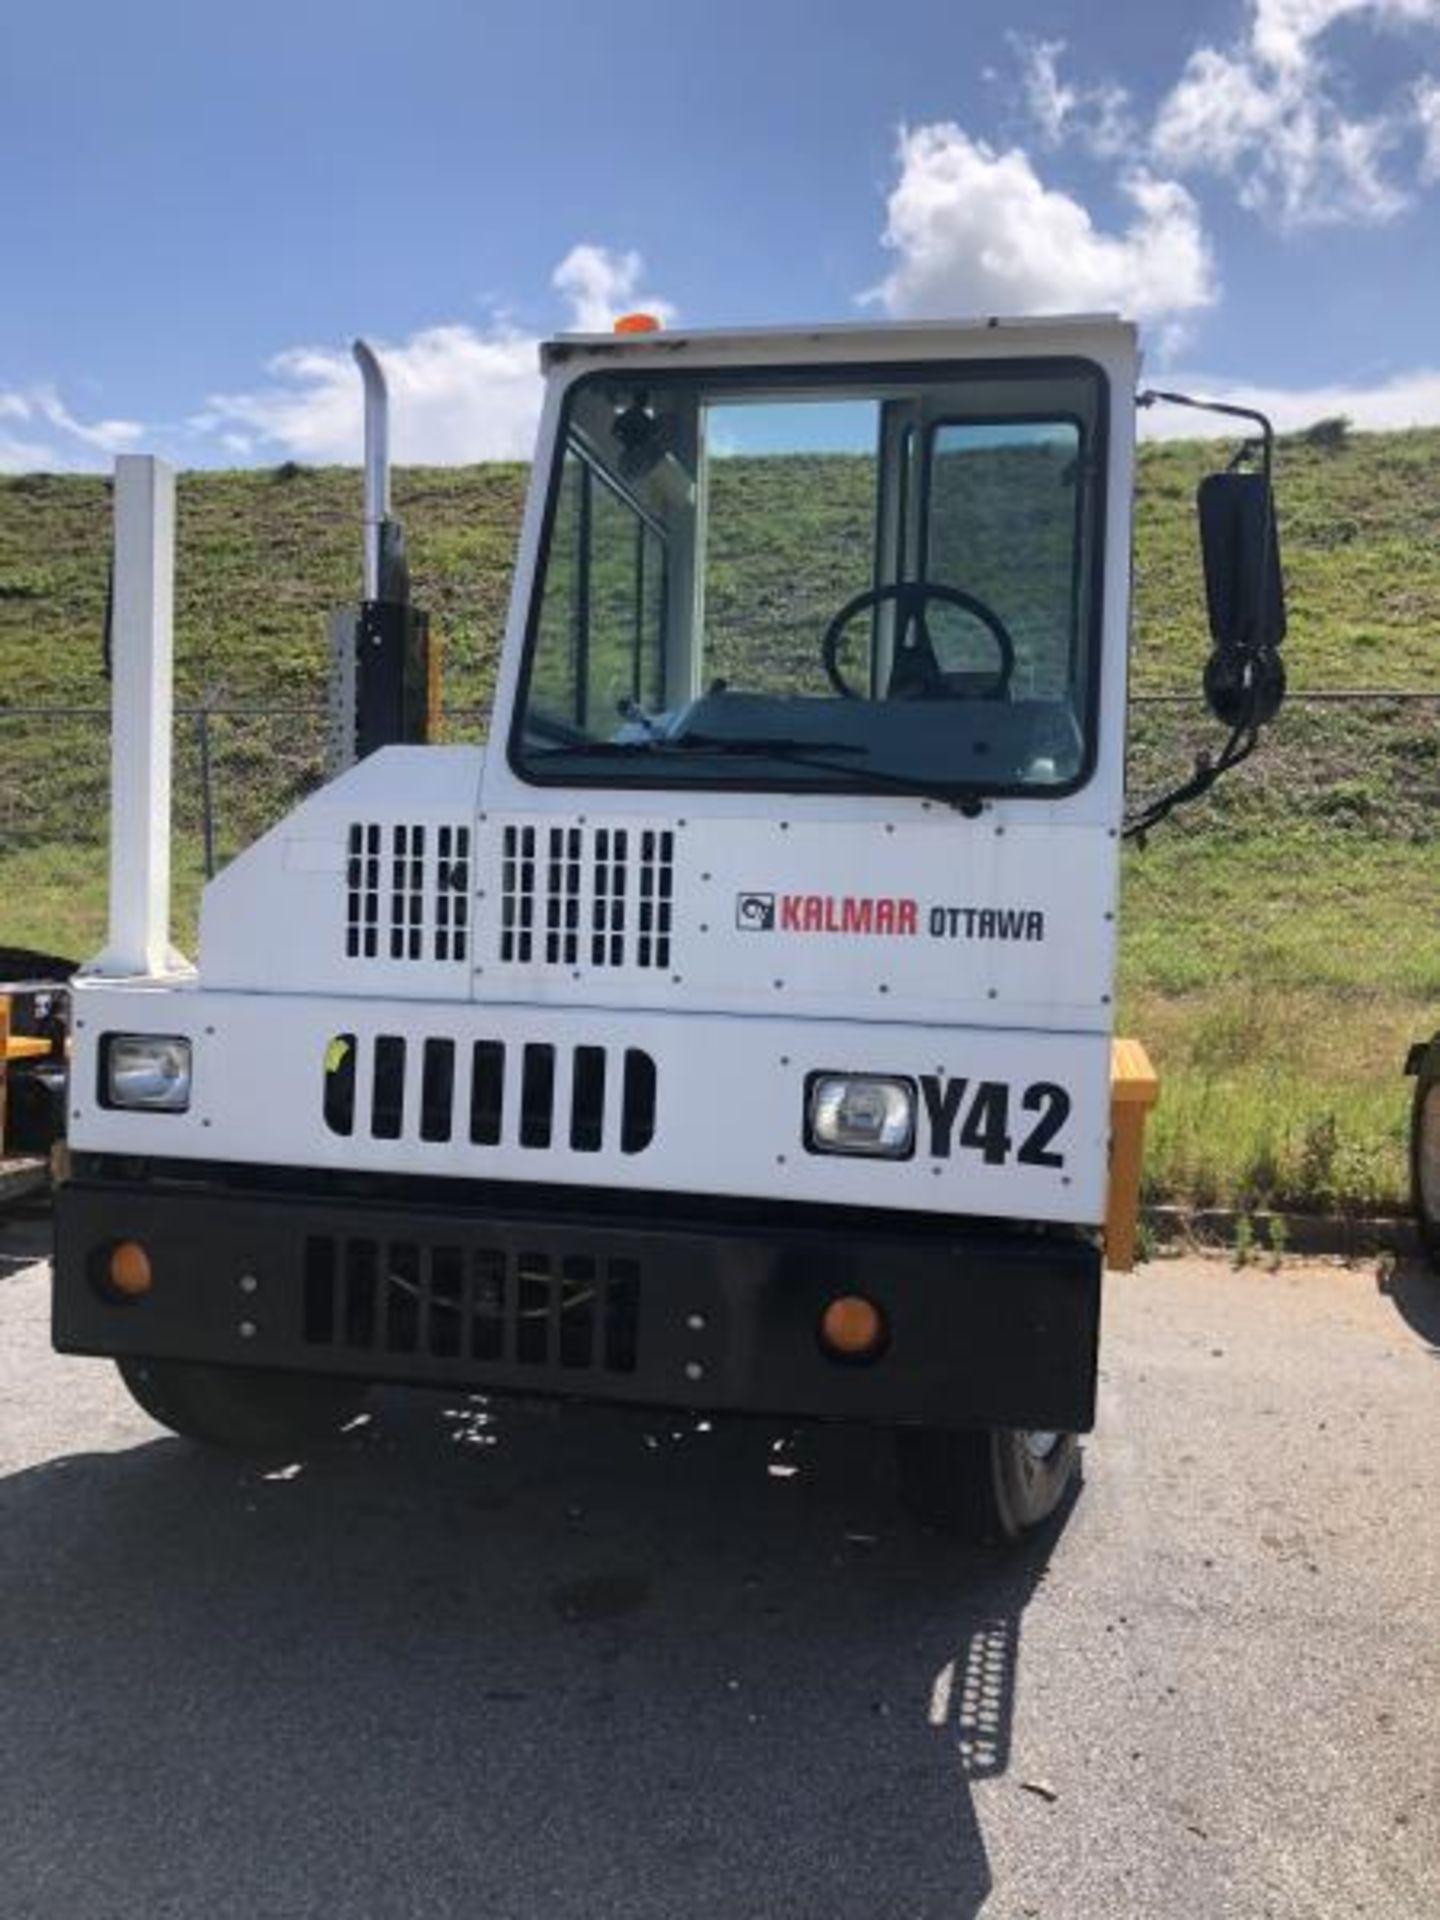 2015 Kalmar Ottawa 4x2 Yard Truck , SN: 338836 1,939.0 Hours, 1,961 Miles - Image 31 of 33